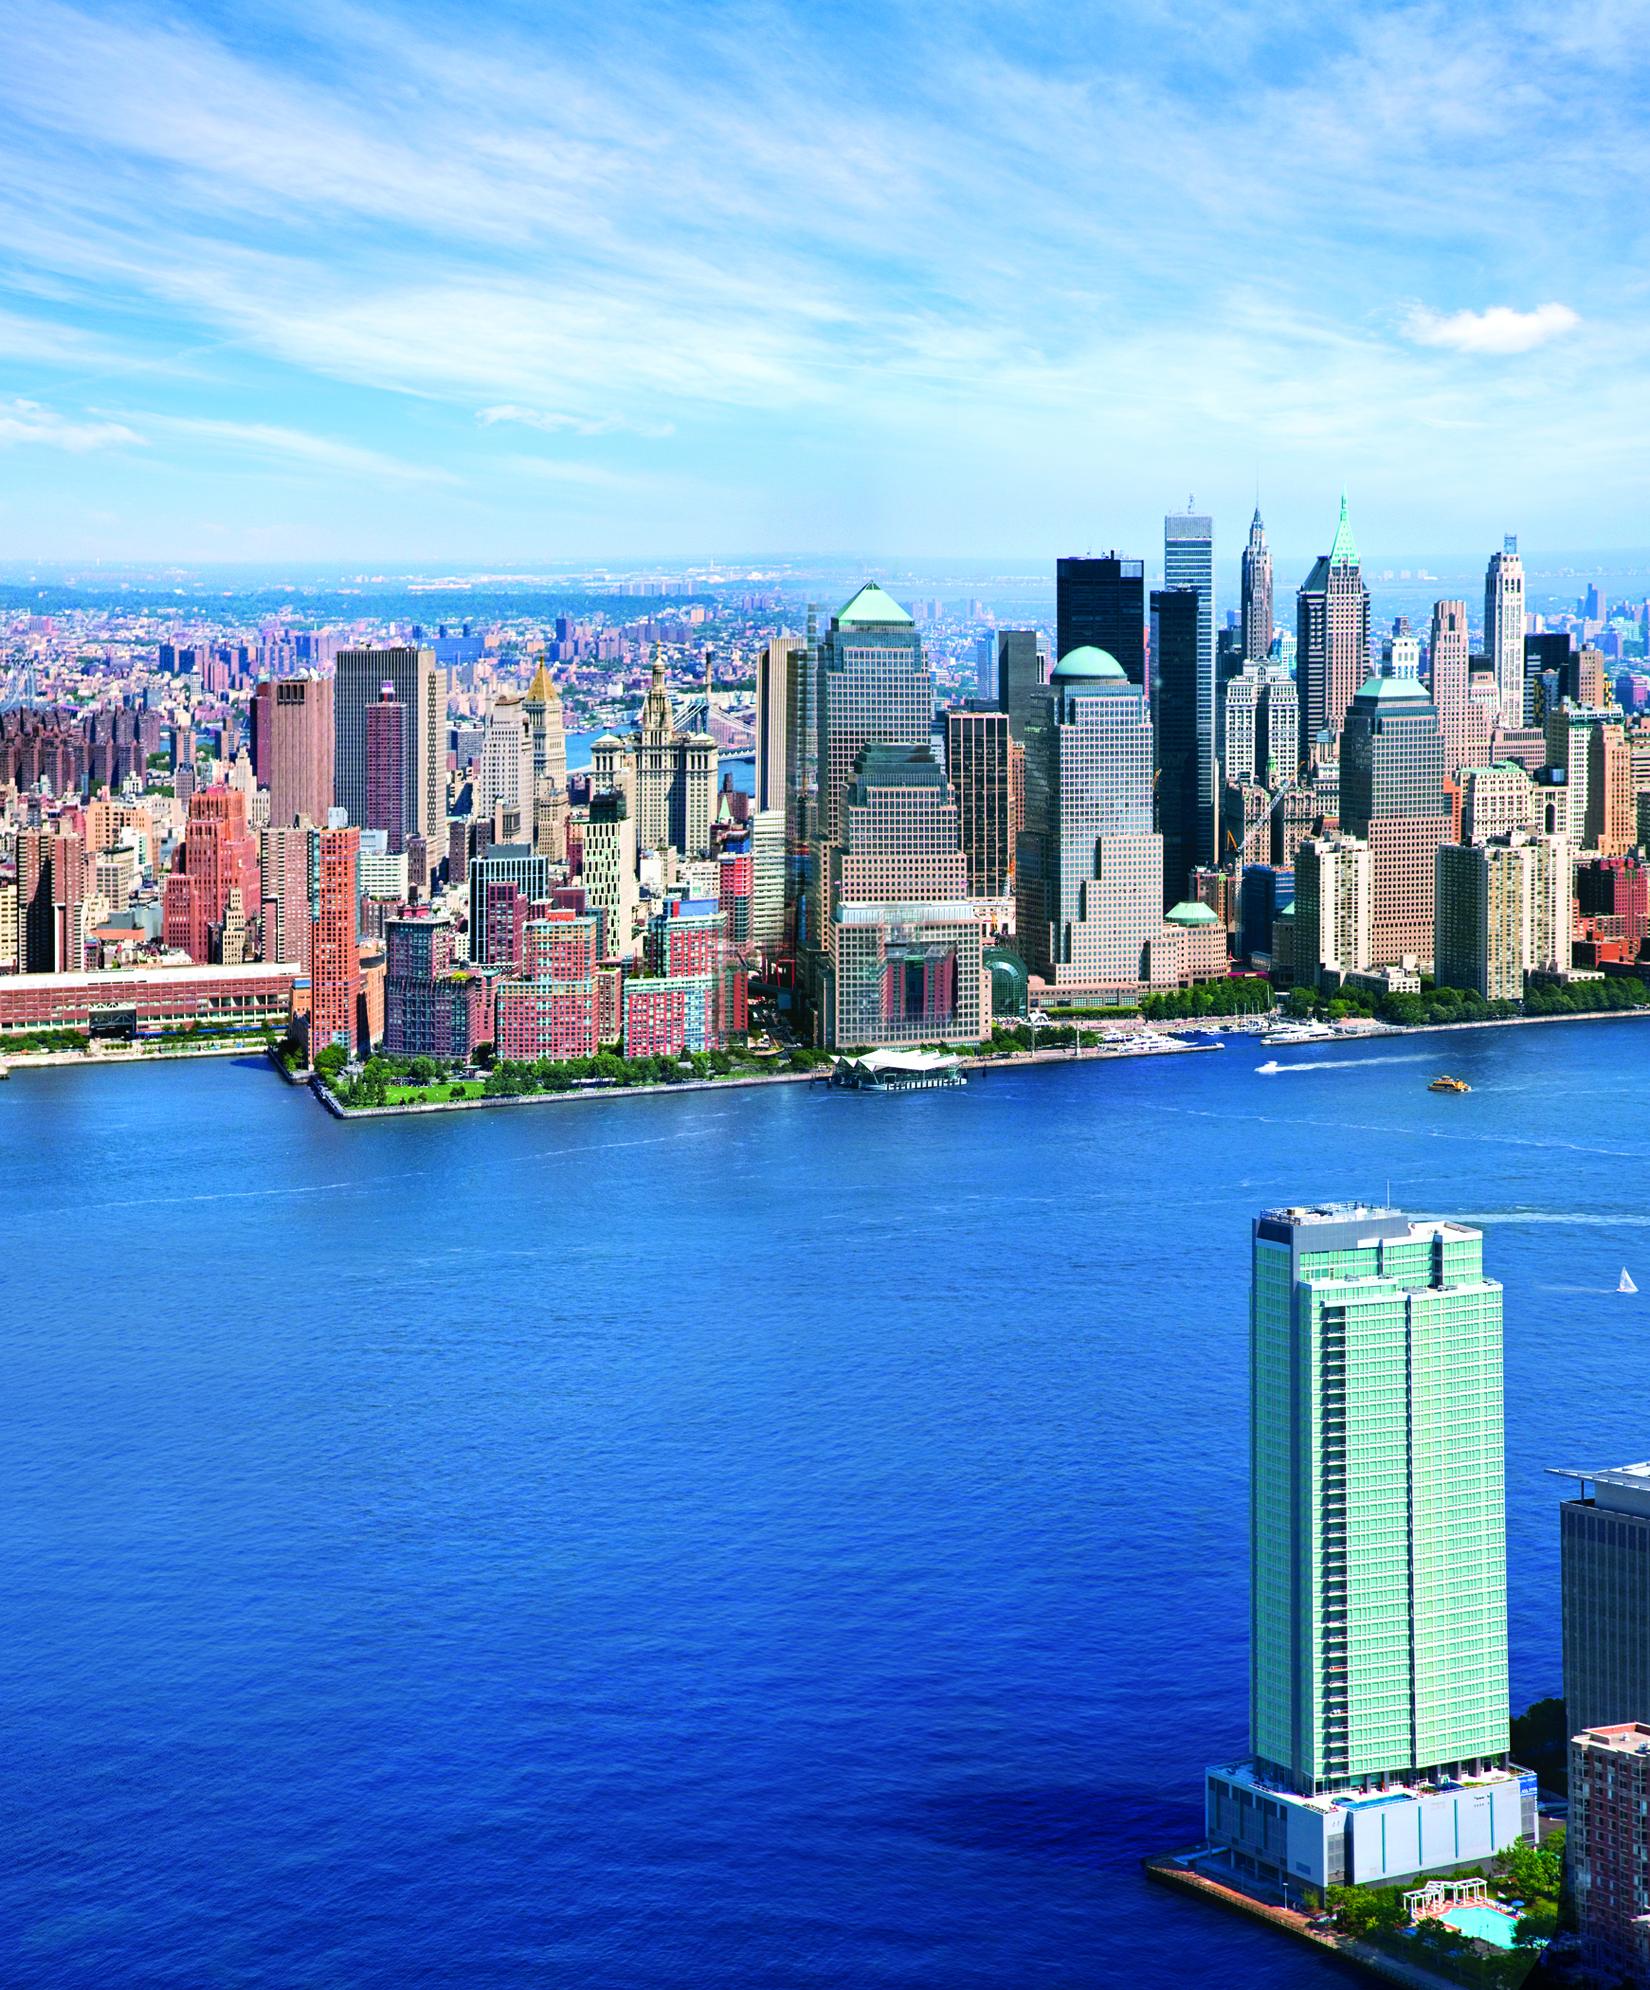 cp_building_aerial_ed1.jpg